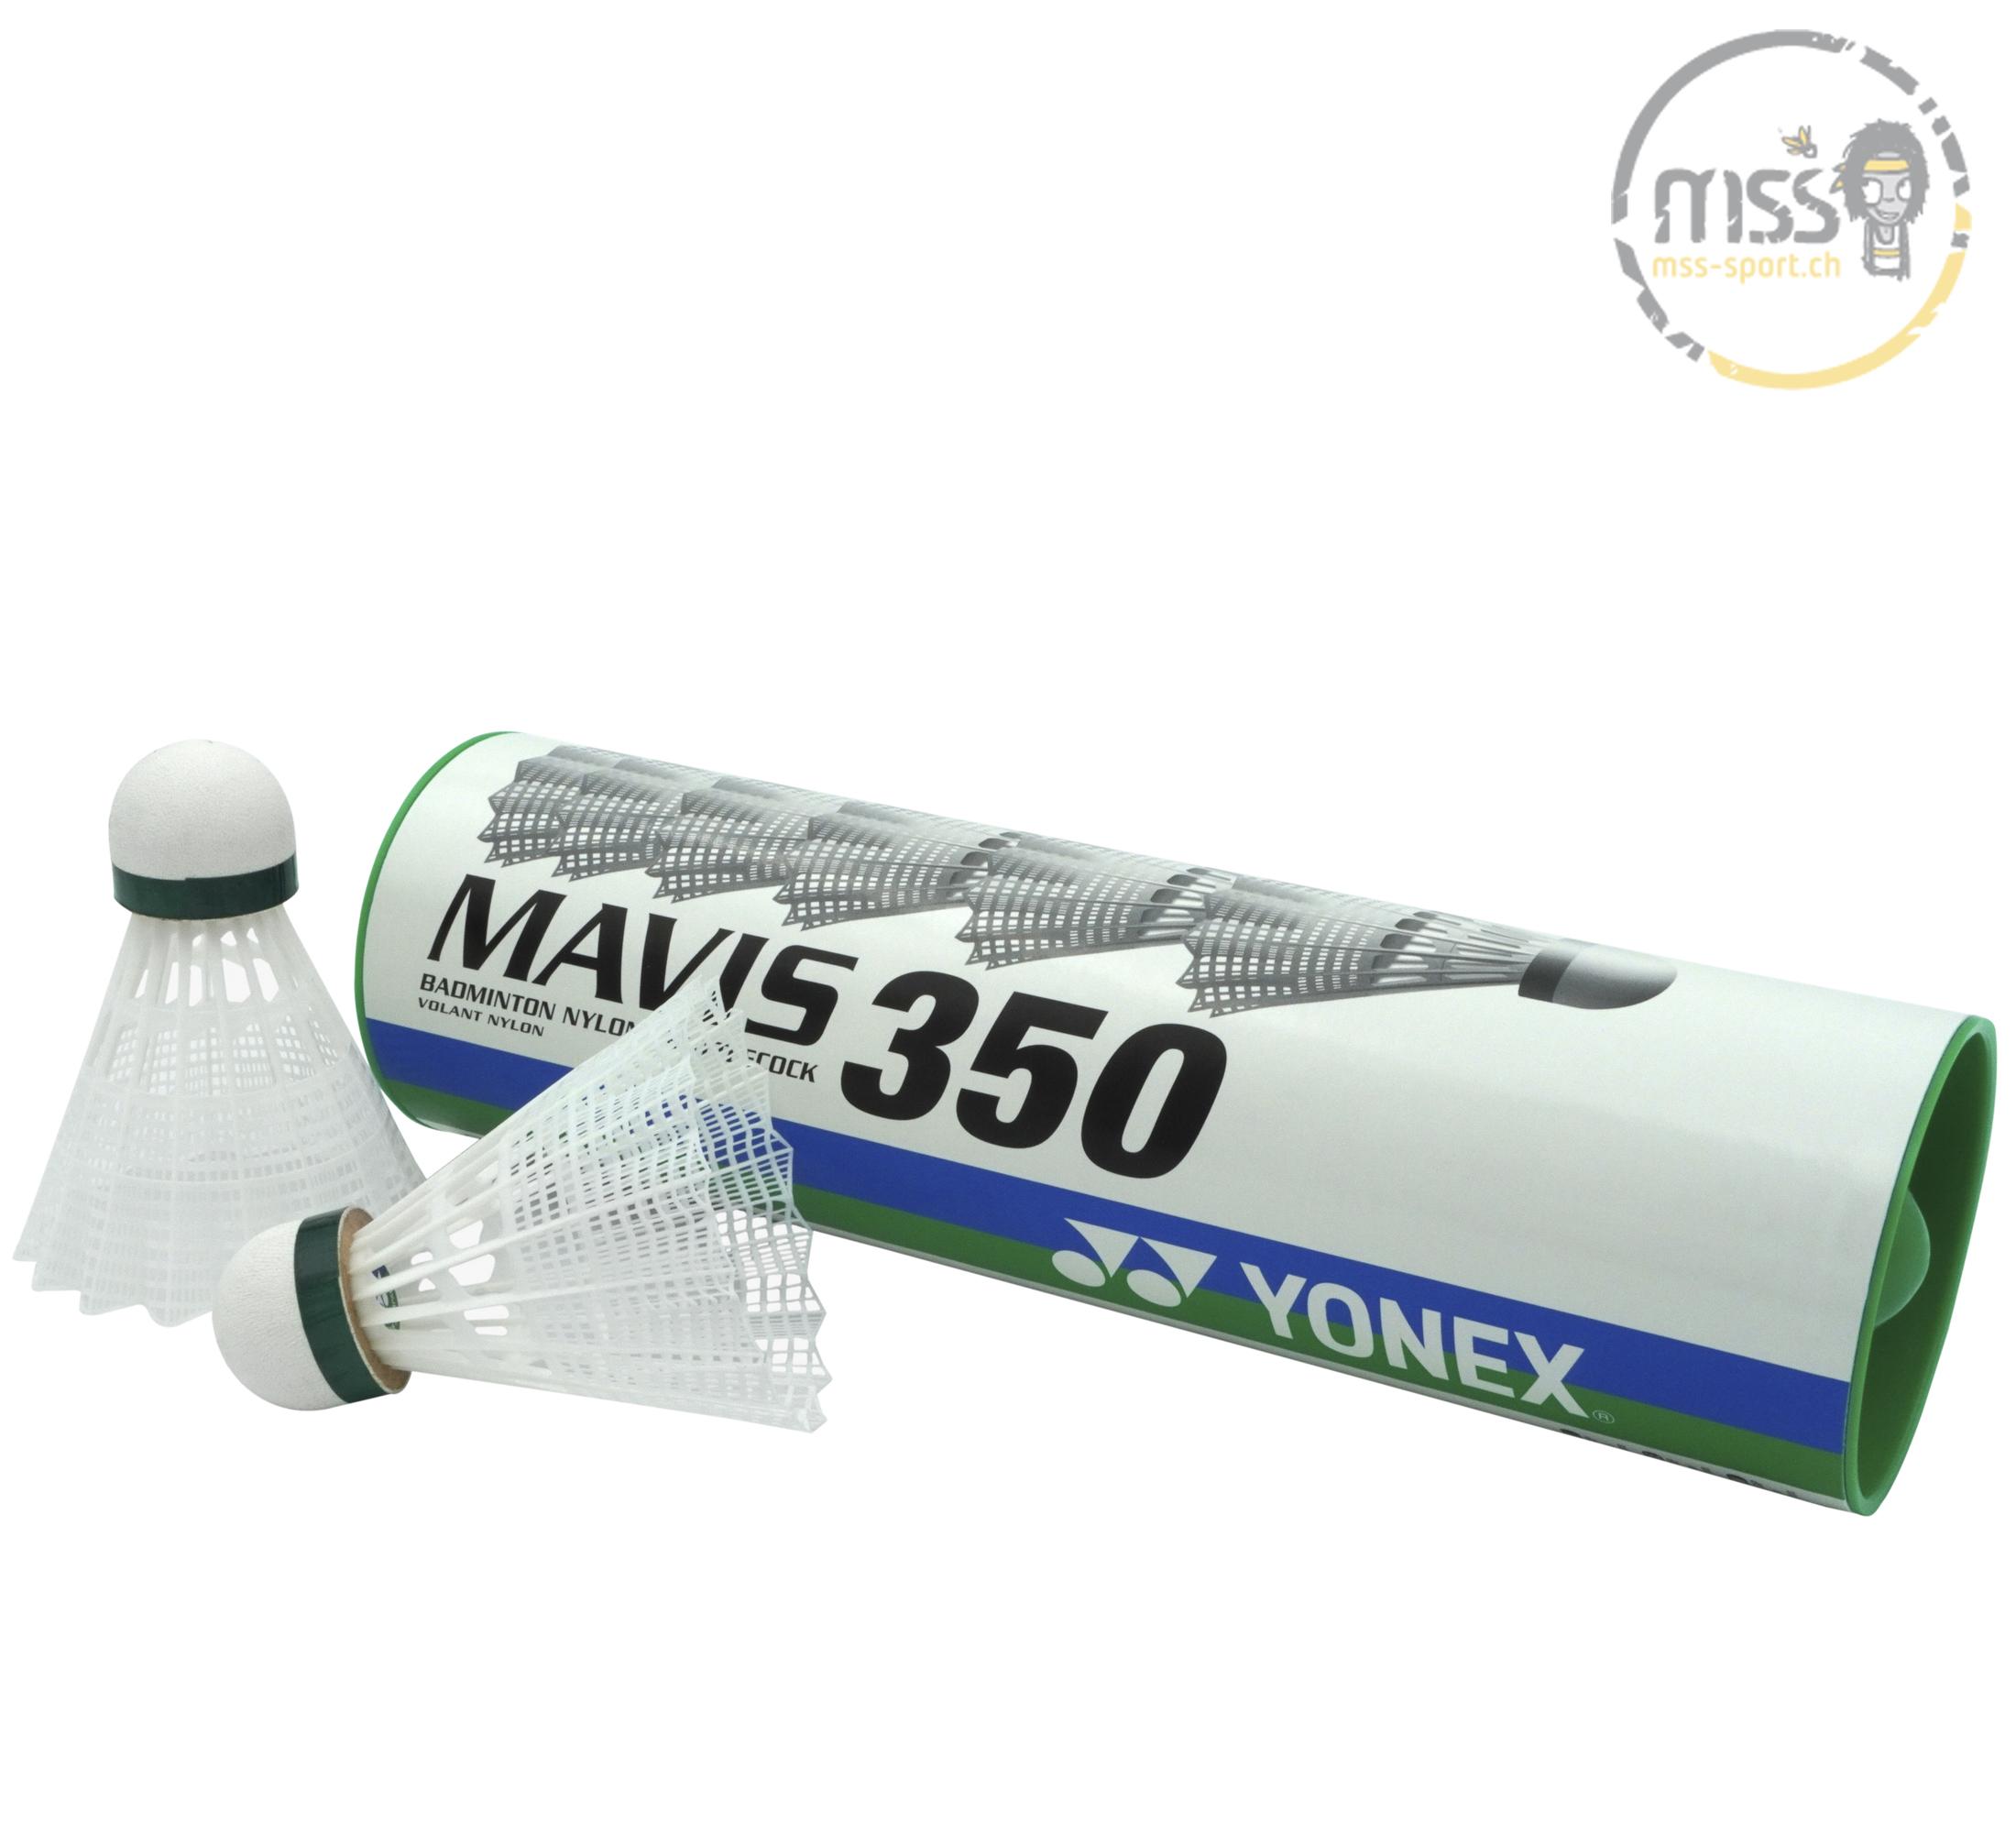 Yonex Mavis 350, white/green